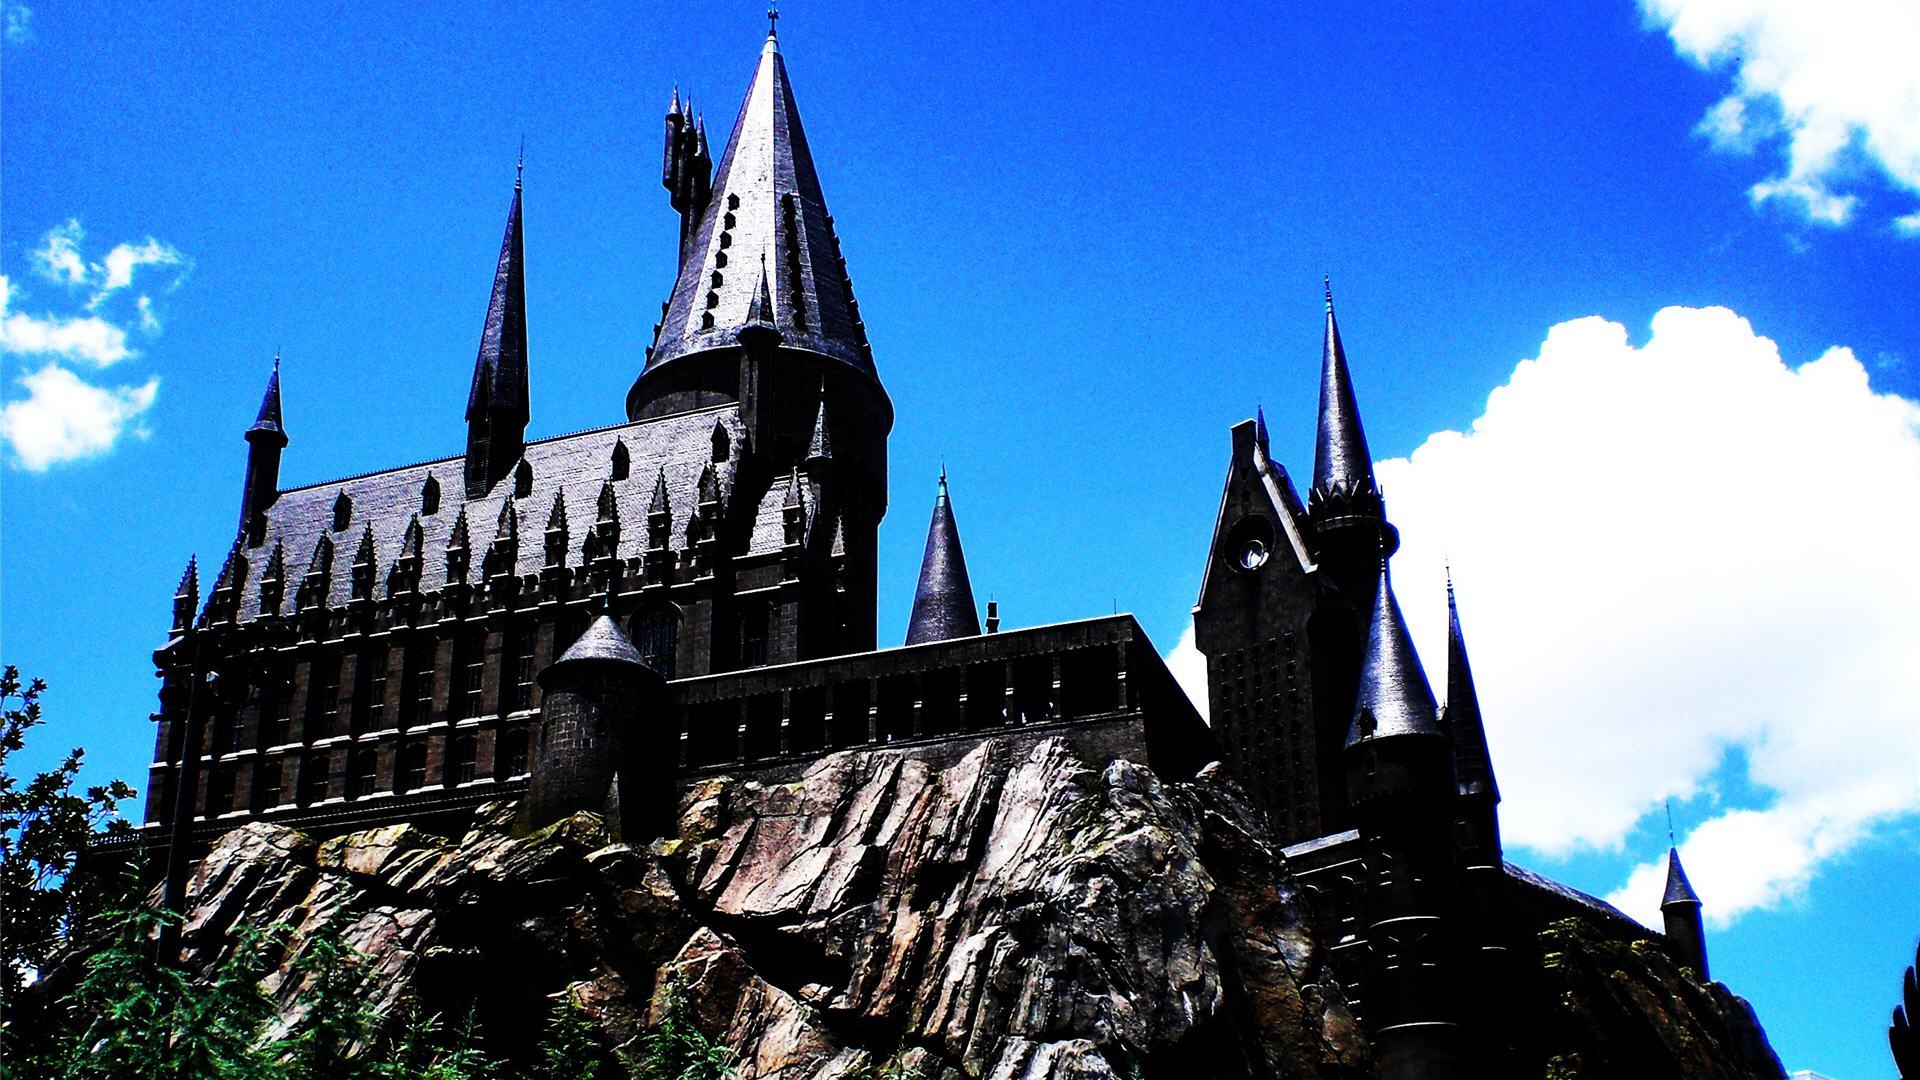 Fall Wallpaper Cartoon Free Download Hogwarts Castle Backgrounds Pixelstalk Net